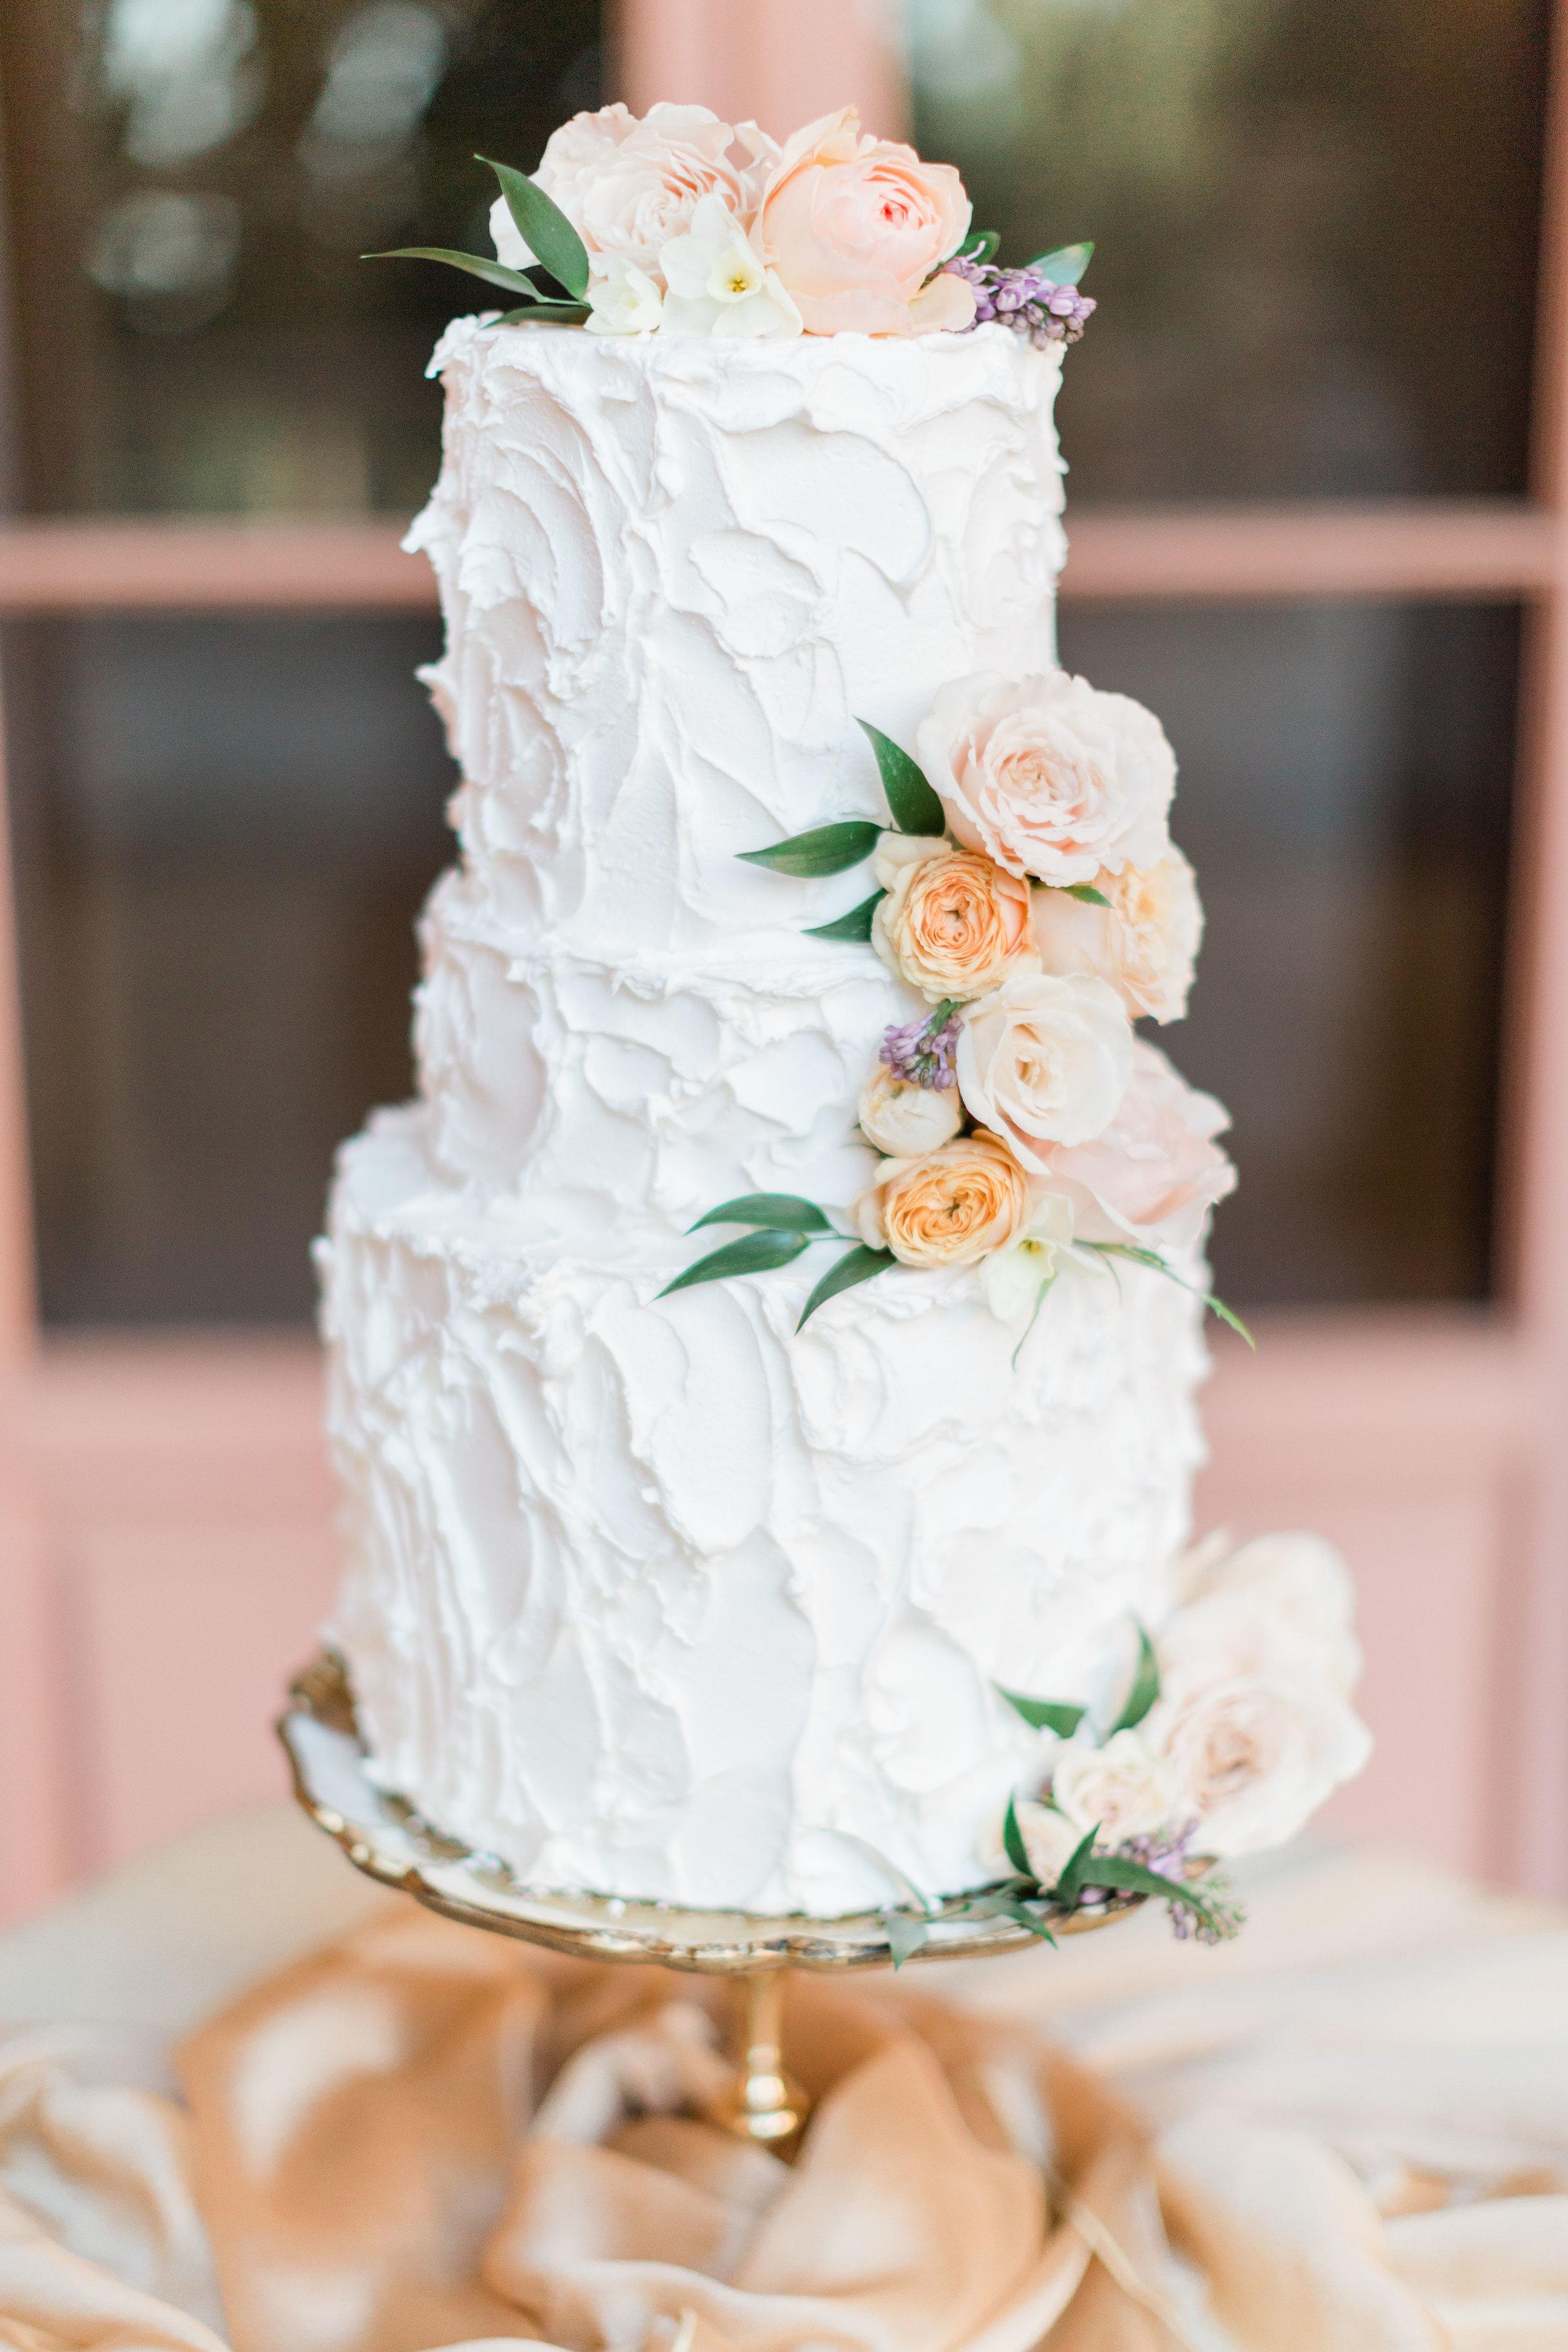 Garden_Style_Lush_Cake_Florals_Sibyl_Sophia_Des_Moines_Iowa.jpg